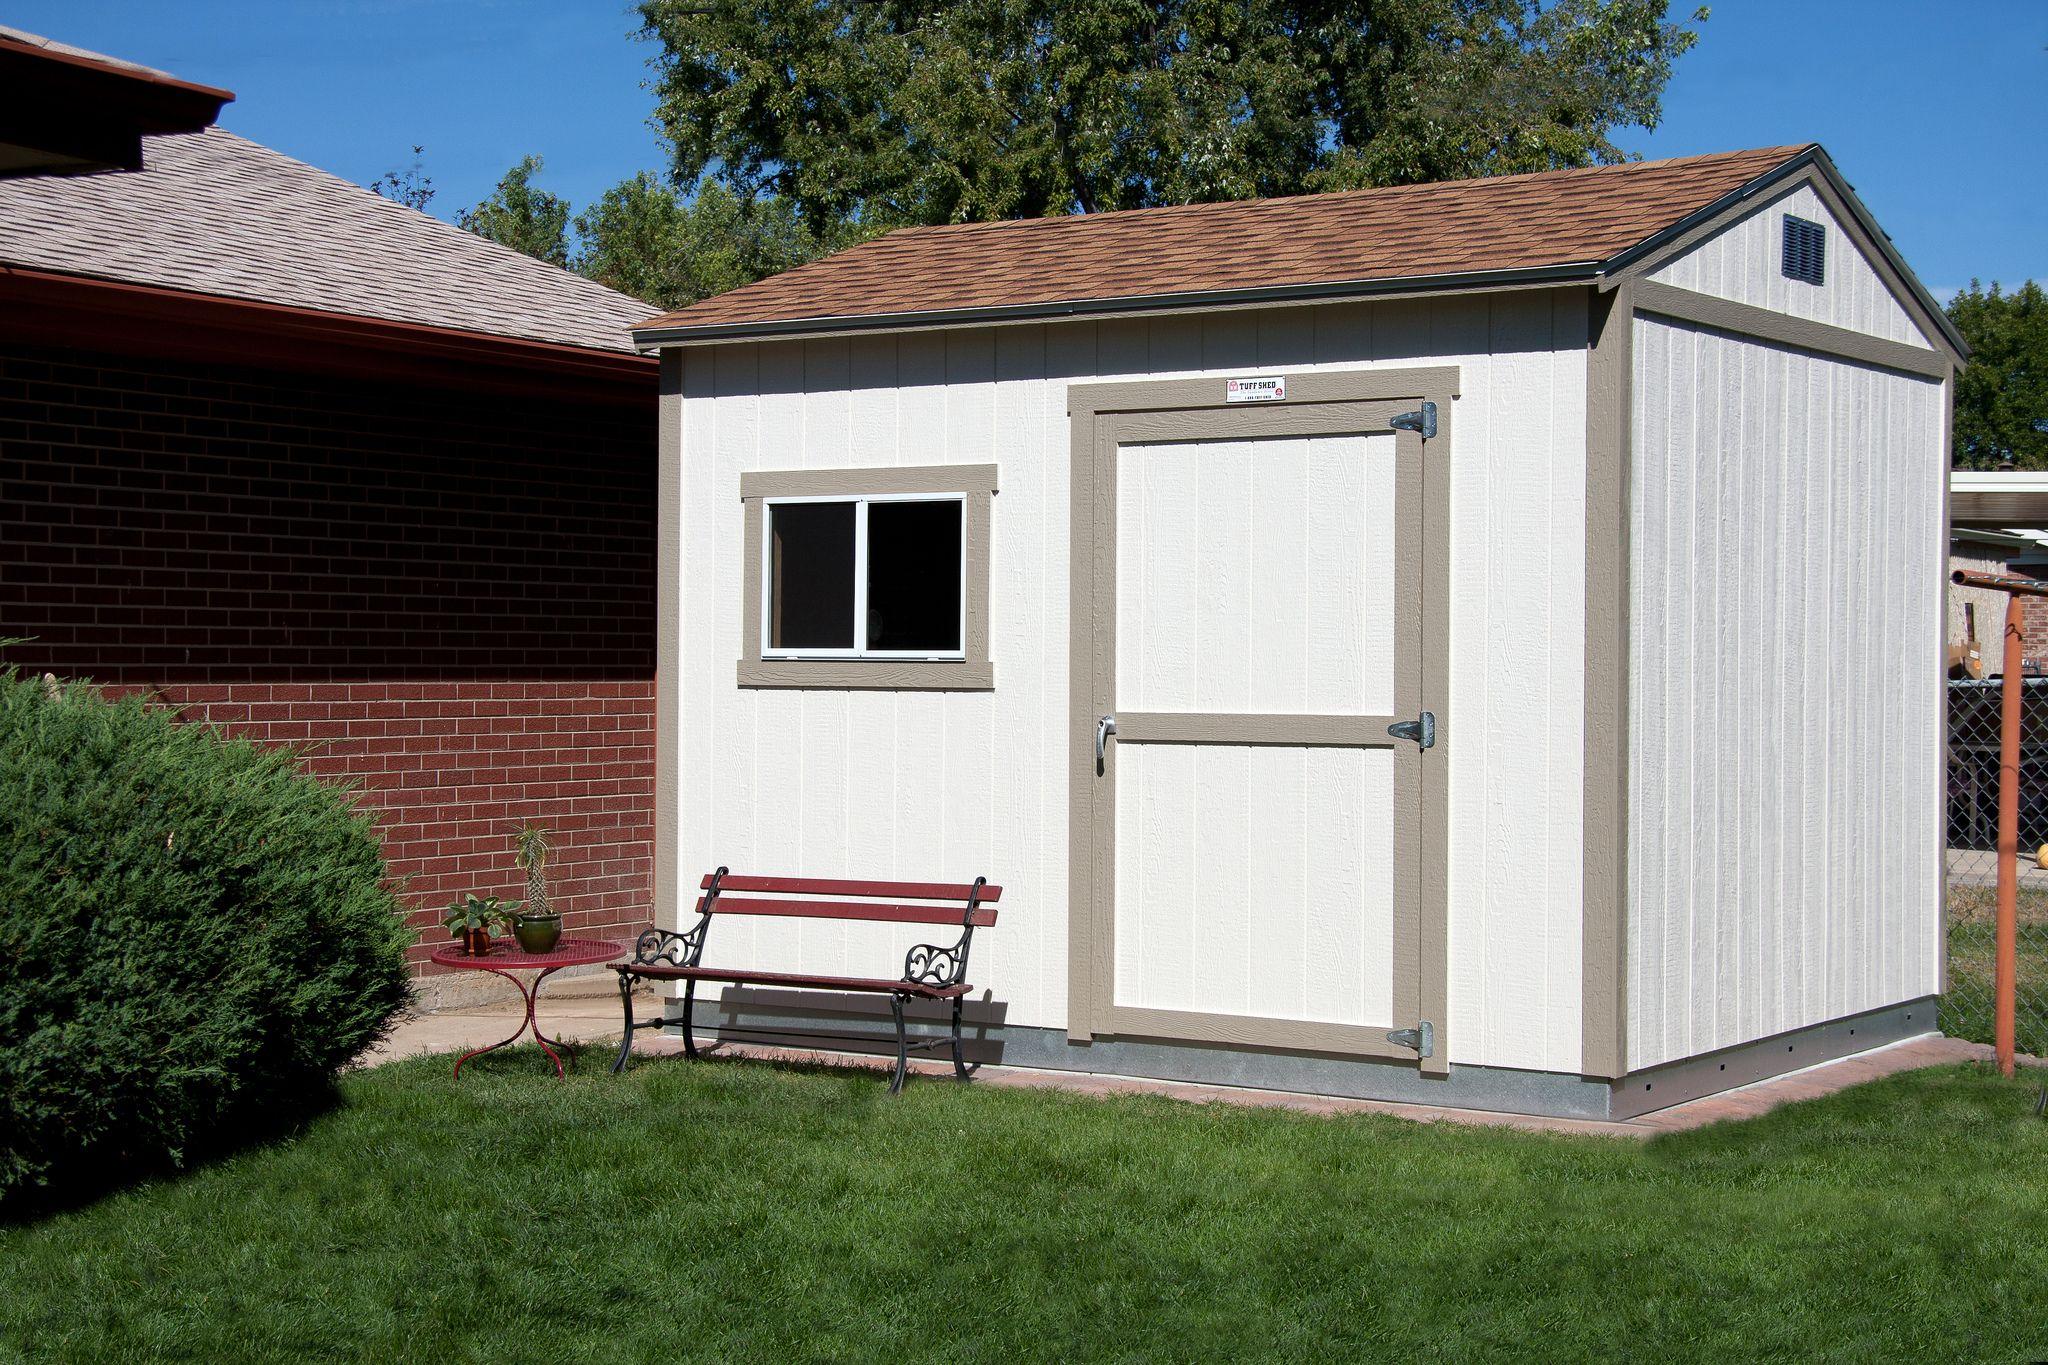 https flic kr p fbarfz tuff shed sundance tr 800 in the pool shed designs